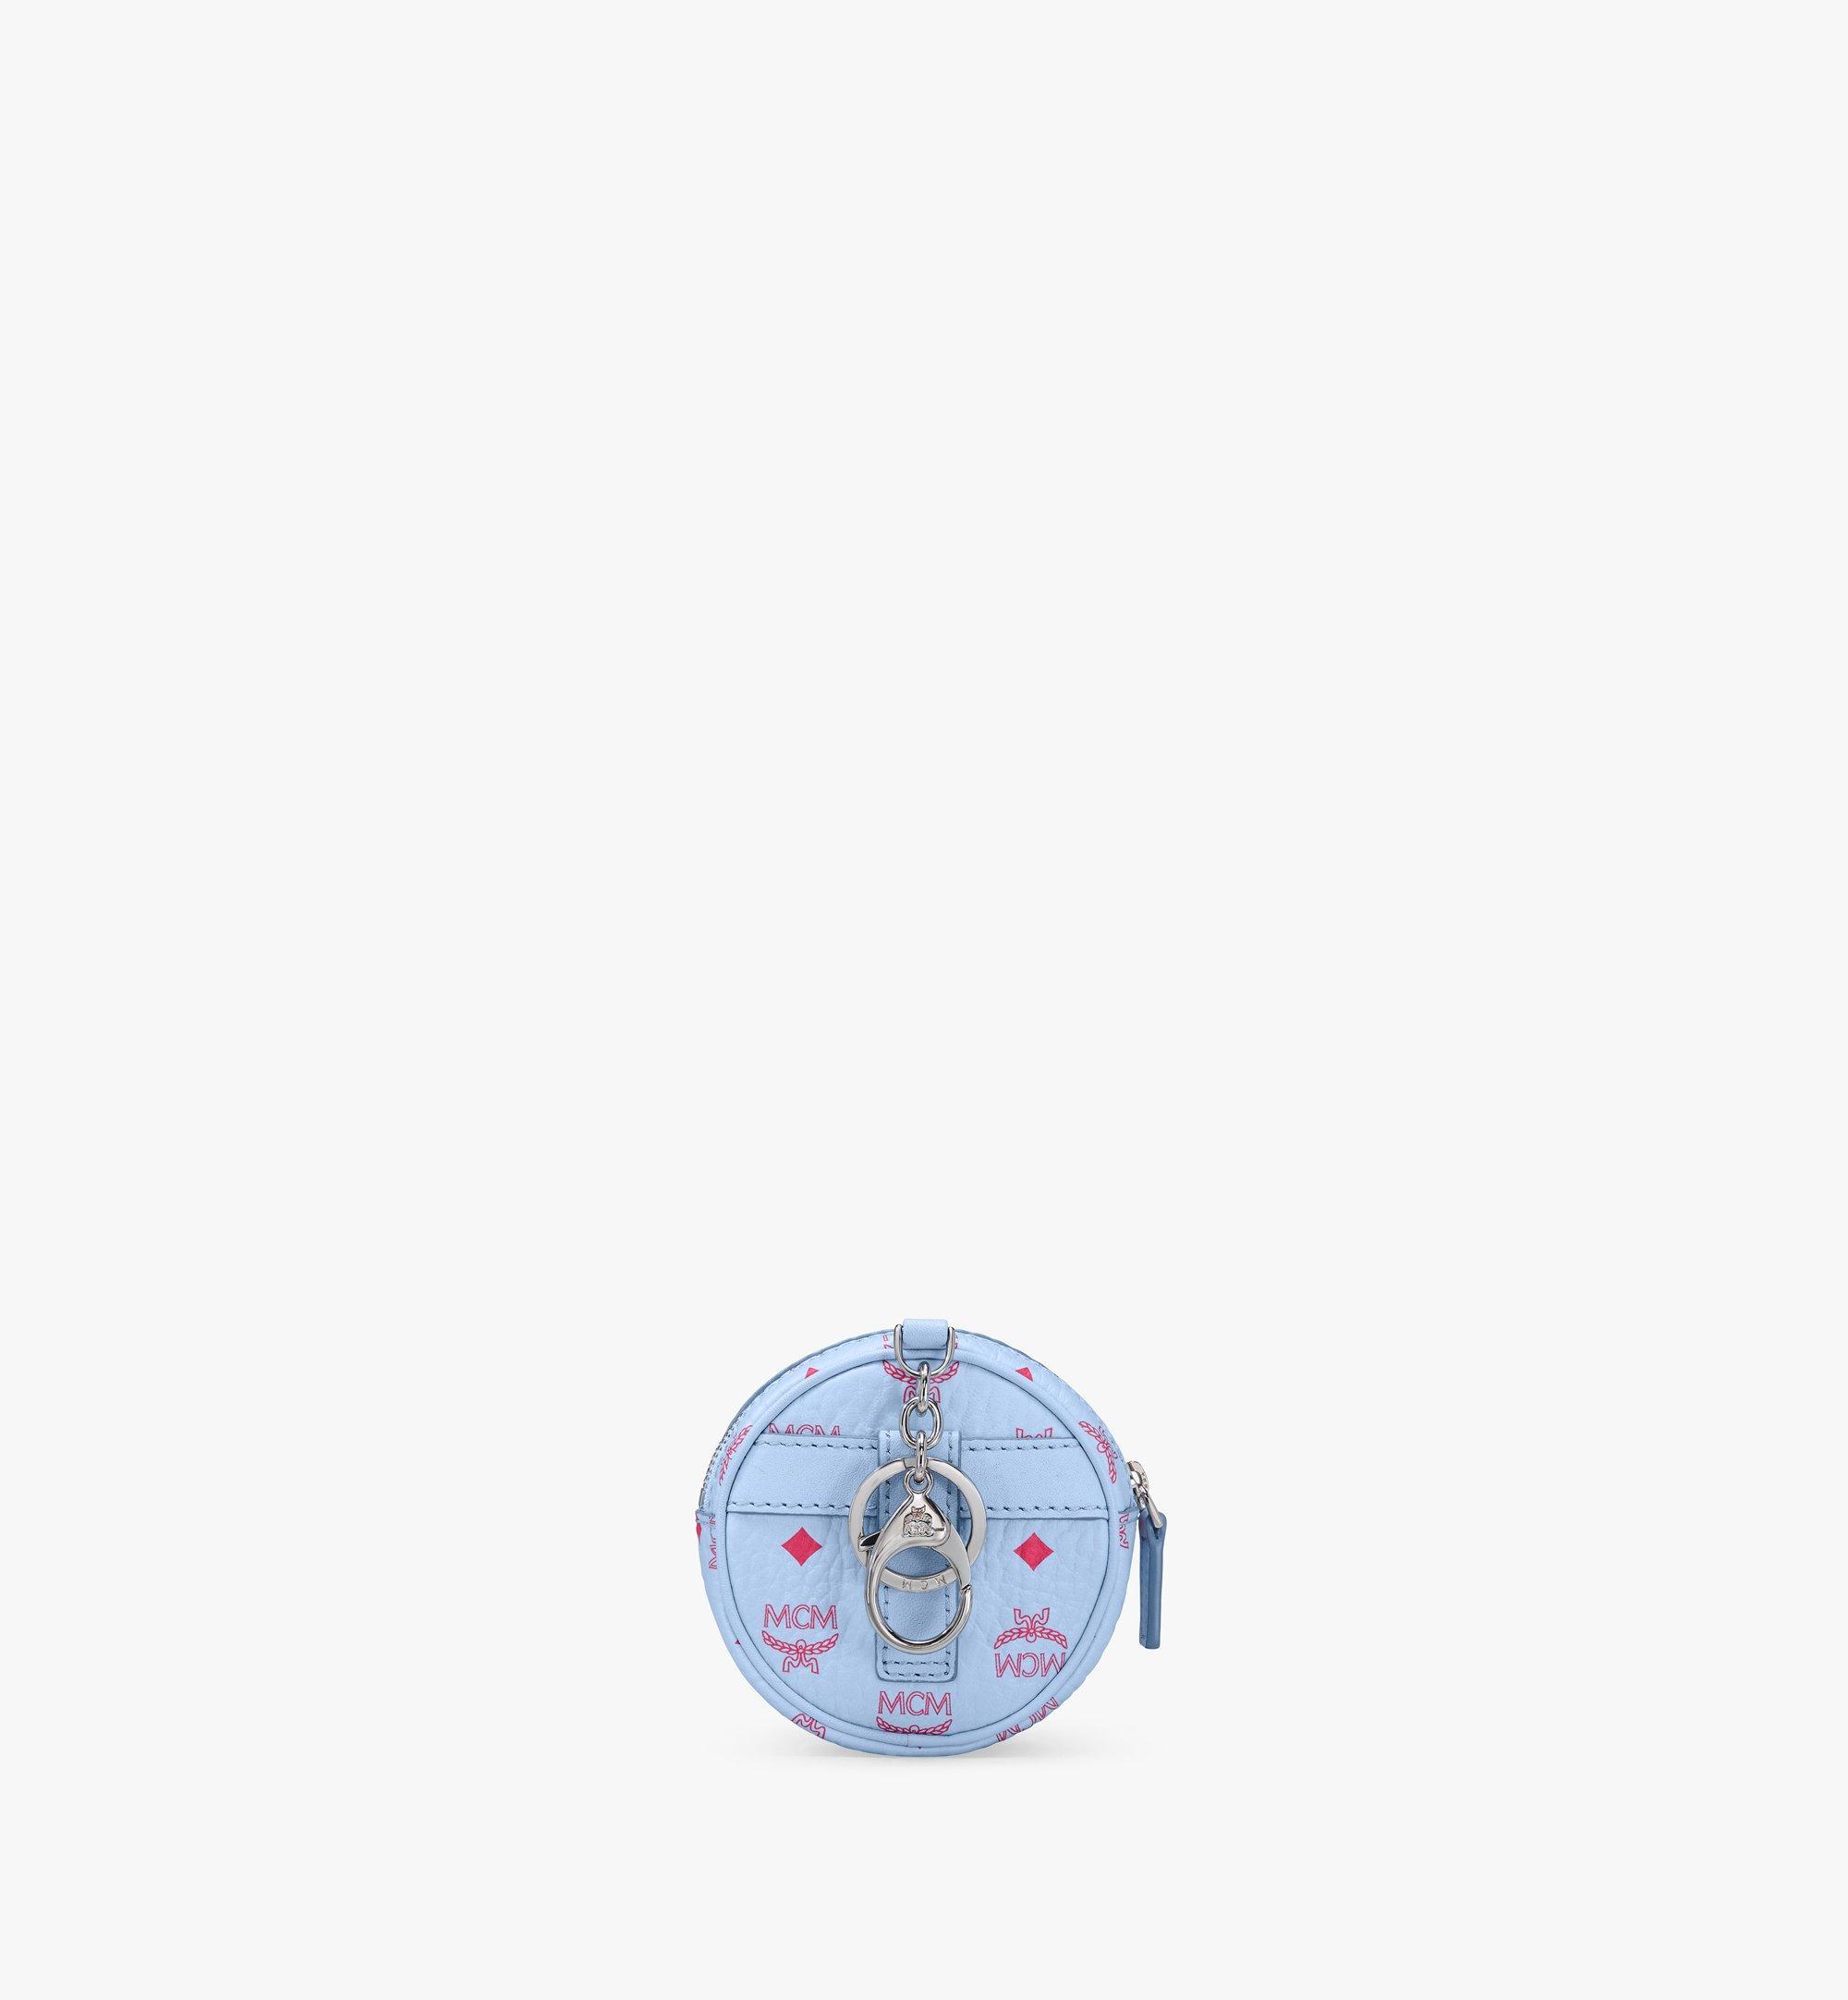 MCM タンバリンバッグ チャーム - ヴィセトス、クロスボディストラップ付き Blue MXZASVI03H2001 Alternate View 3